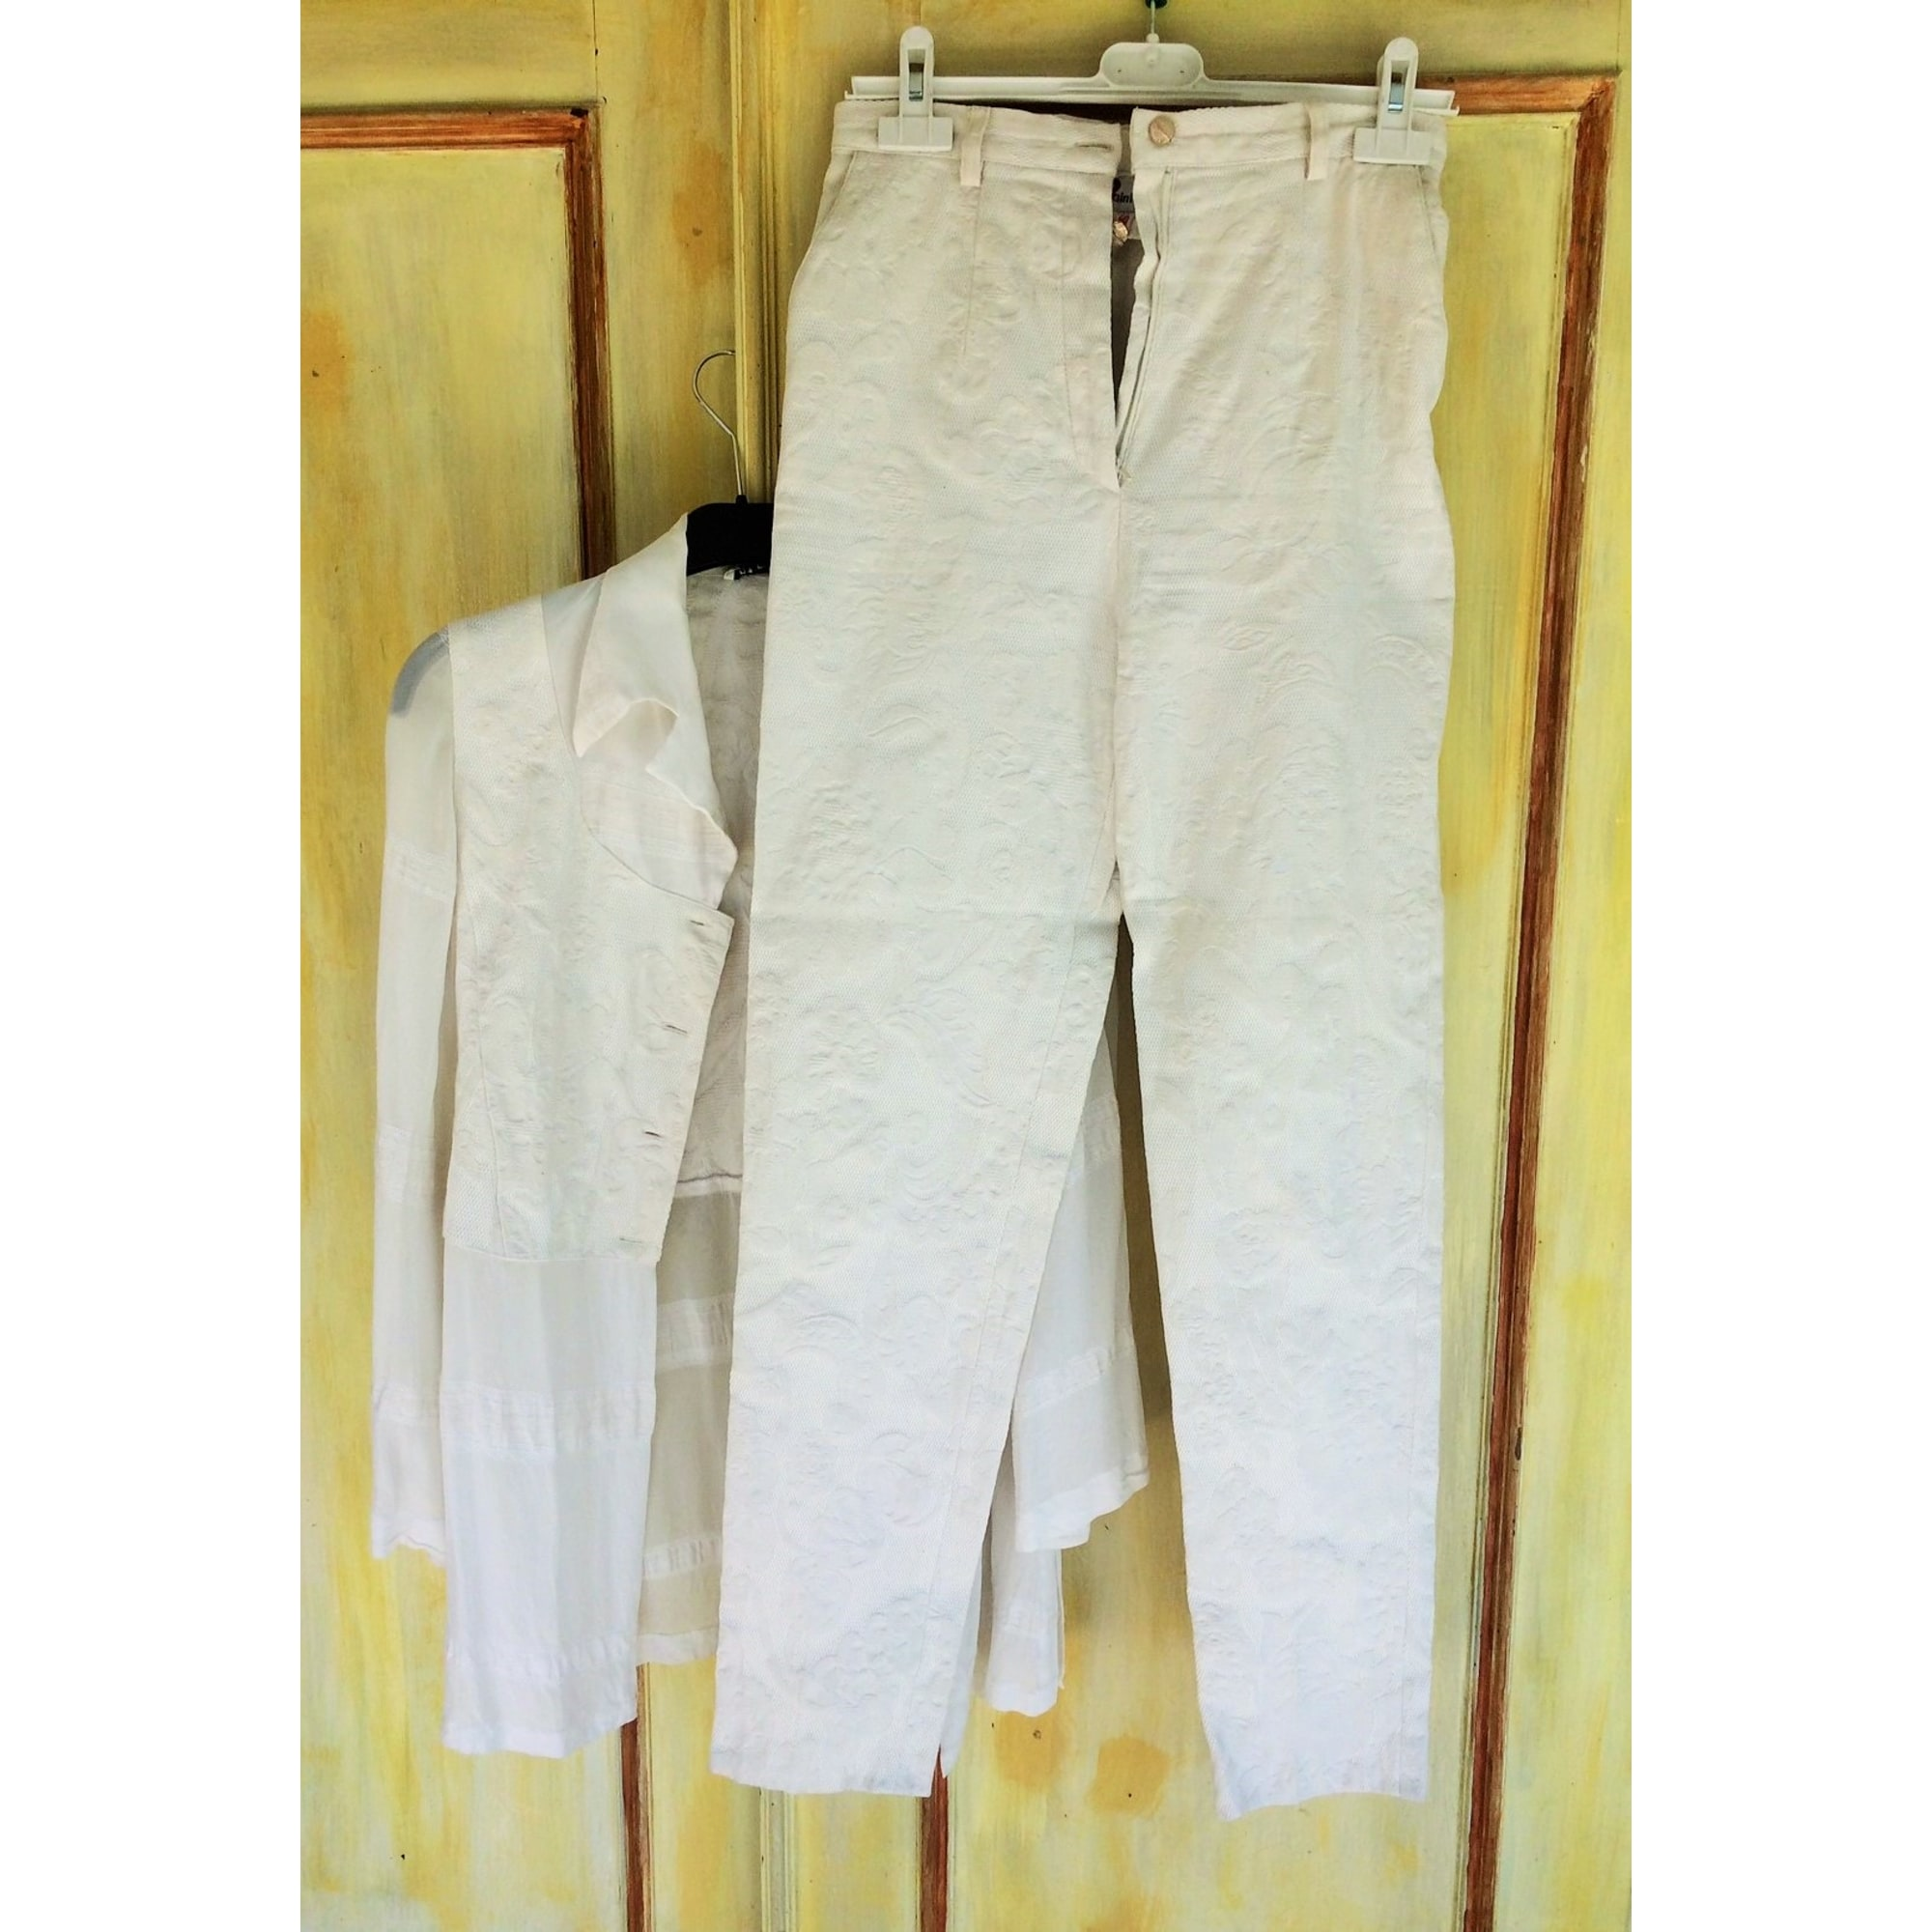 Tailleur pantalon INFINITIF Blanc, blanc cassé, écru